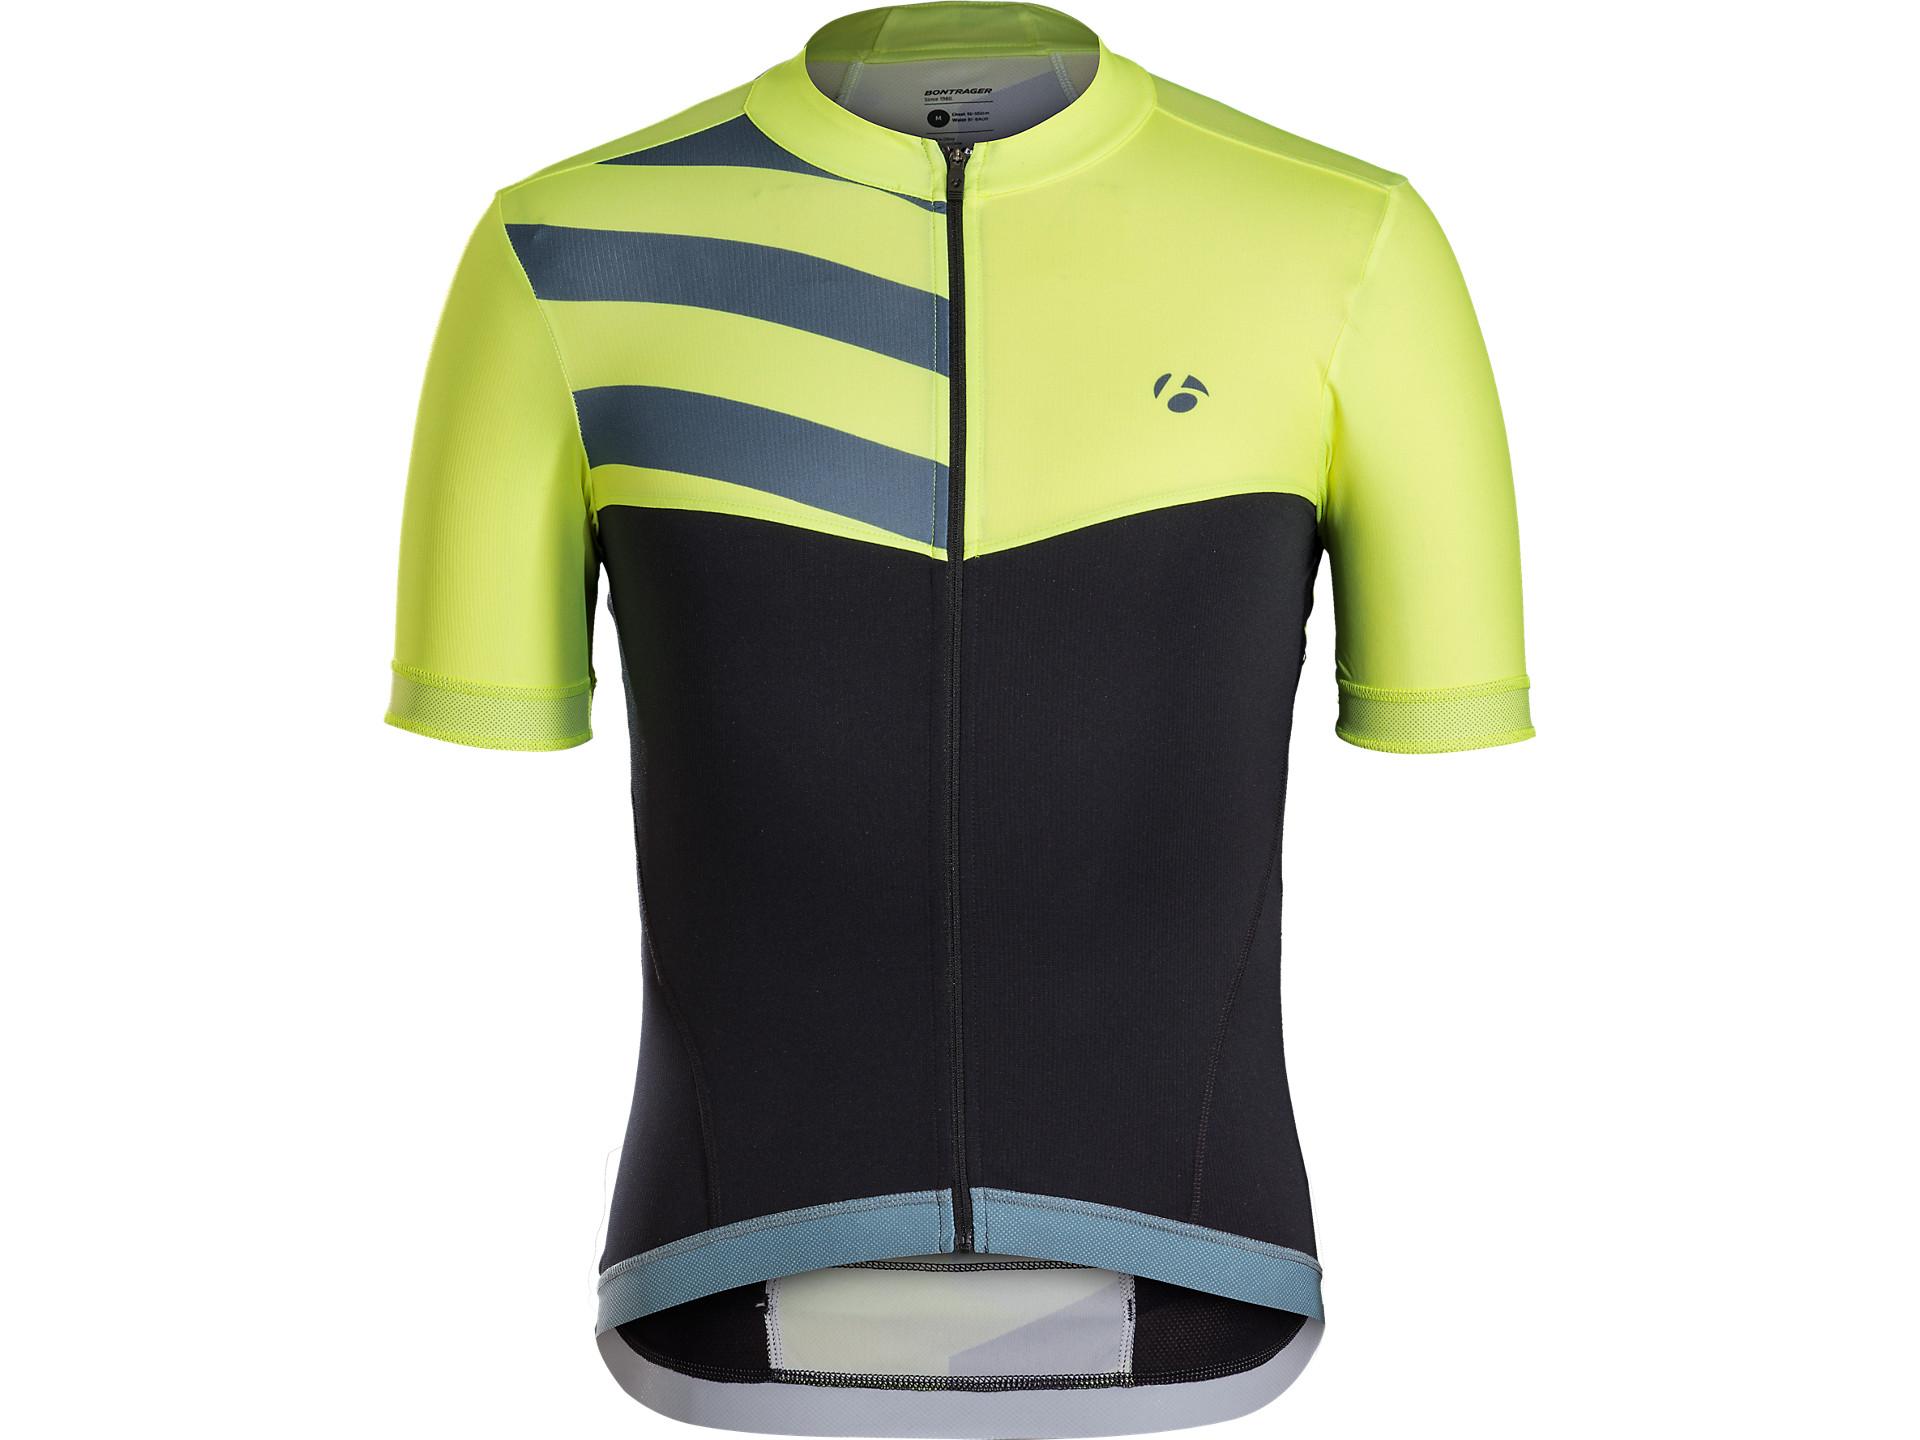 8b66c07de15 Bontrager Velocis Halo Cycling Jersey